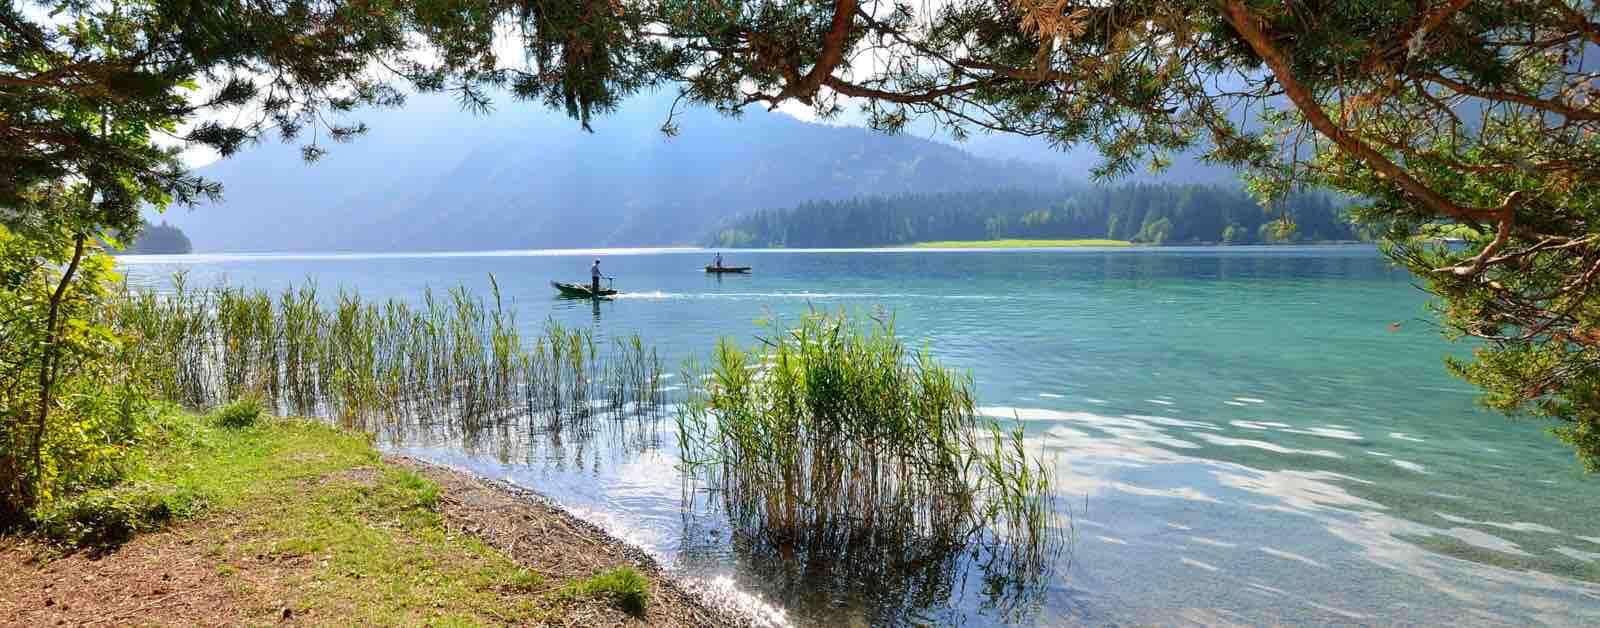 Natur & Wellness i Østrig